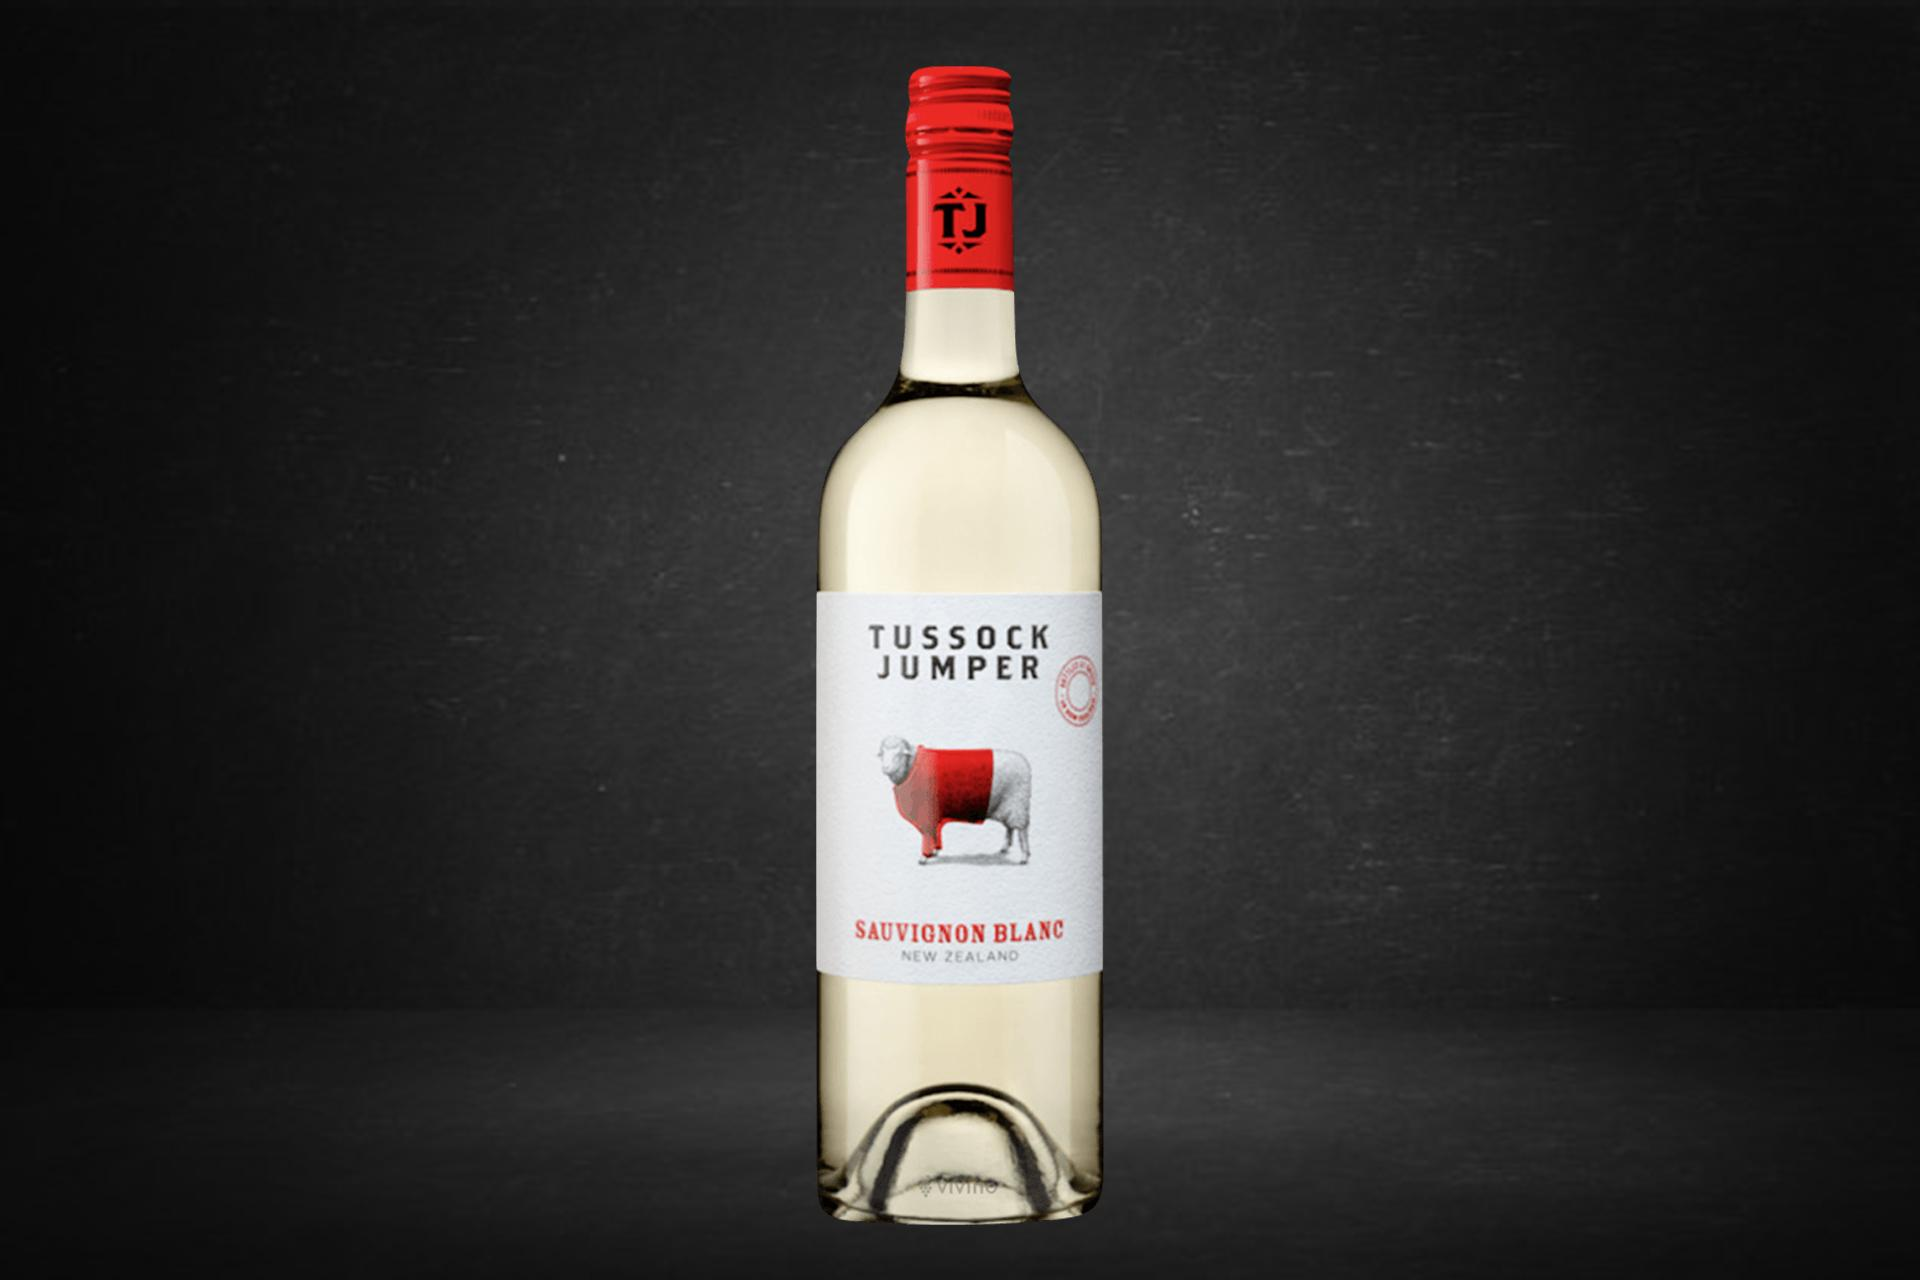 Tussock Jumper, Sauvignon Blanc